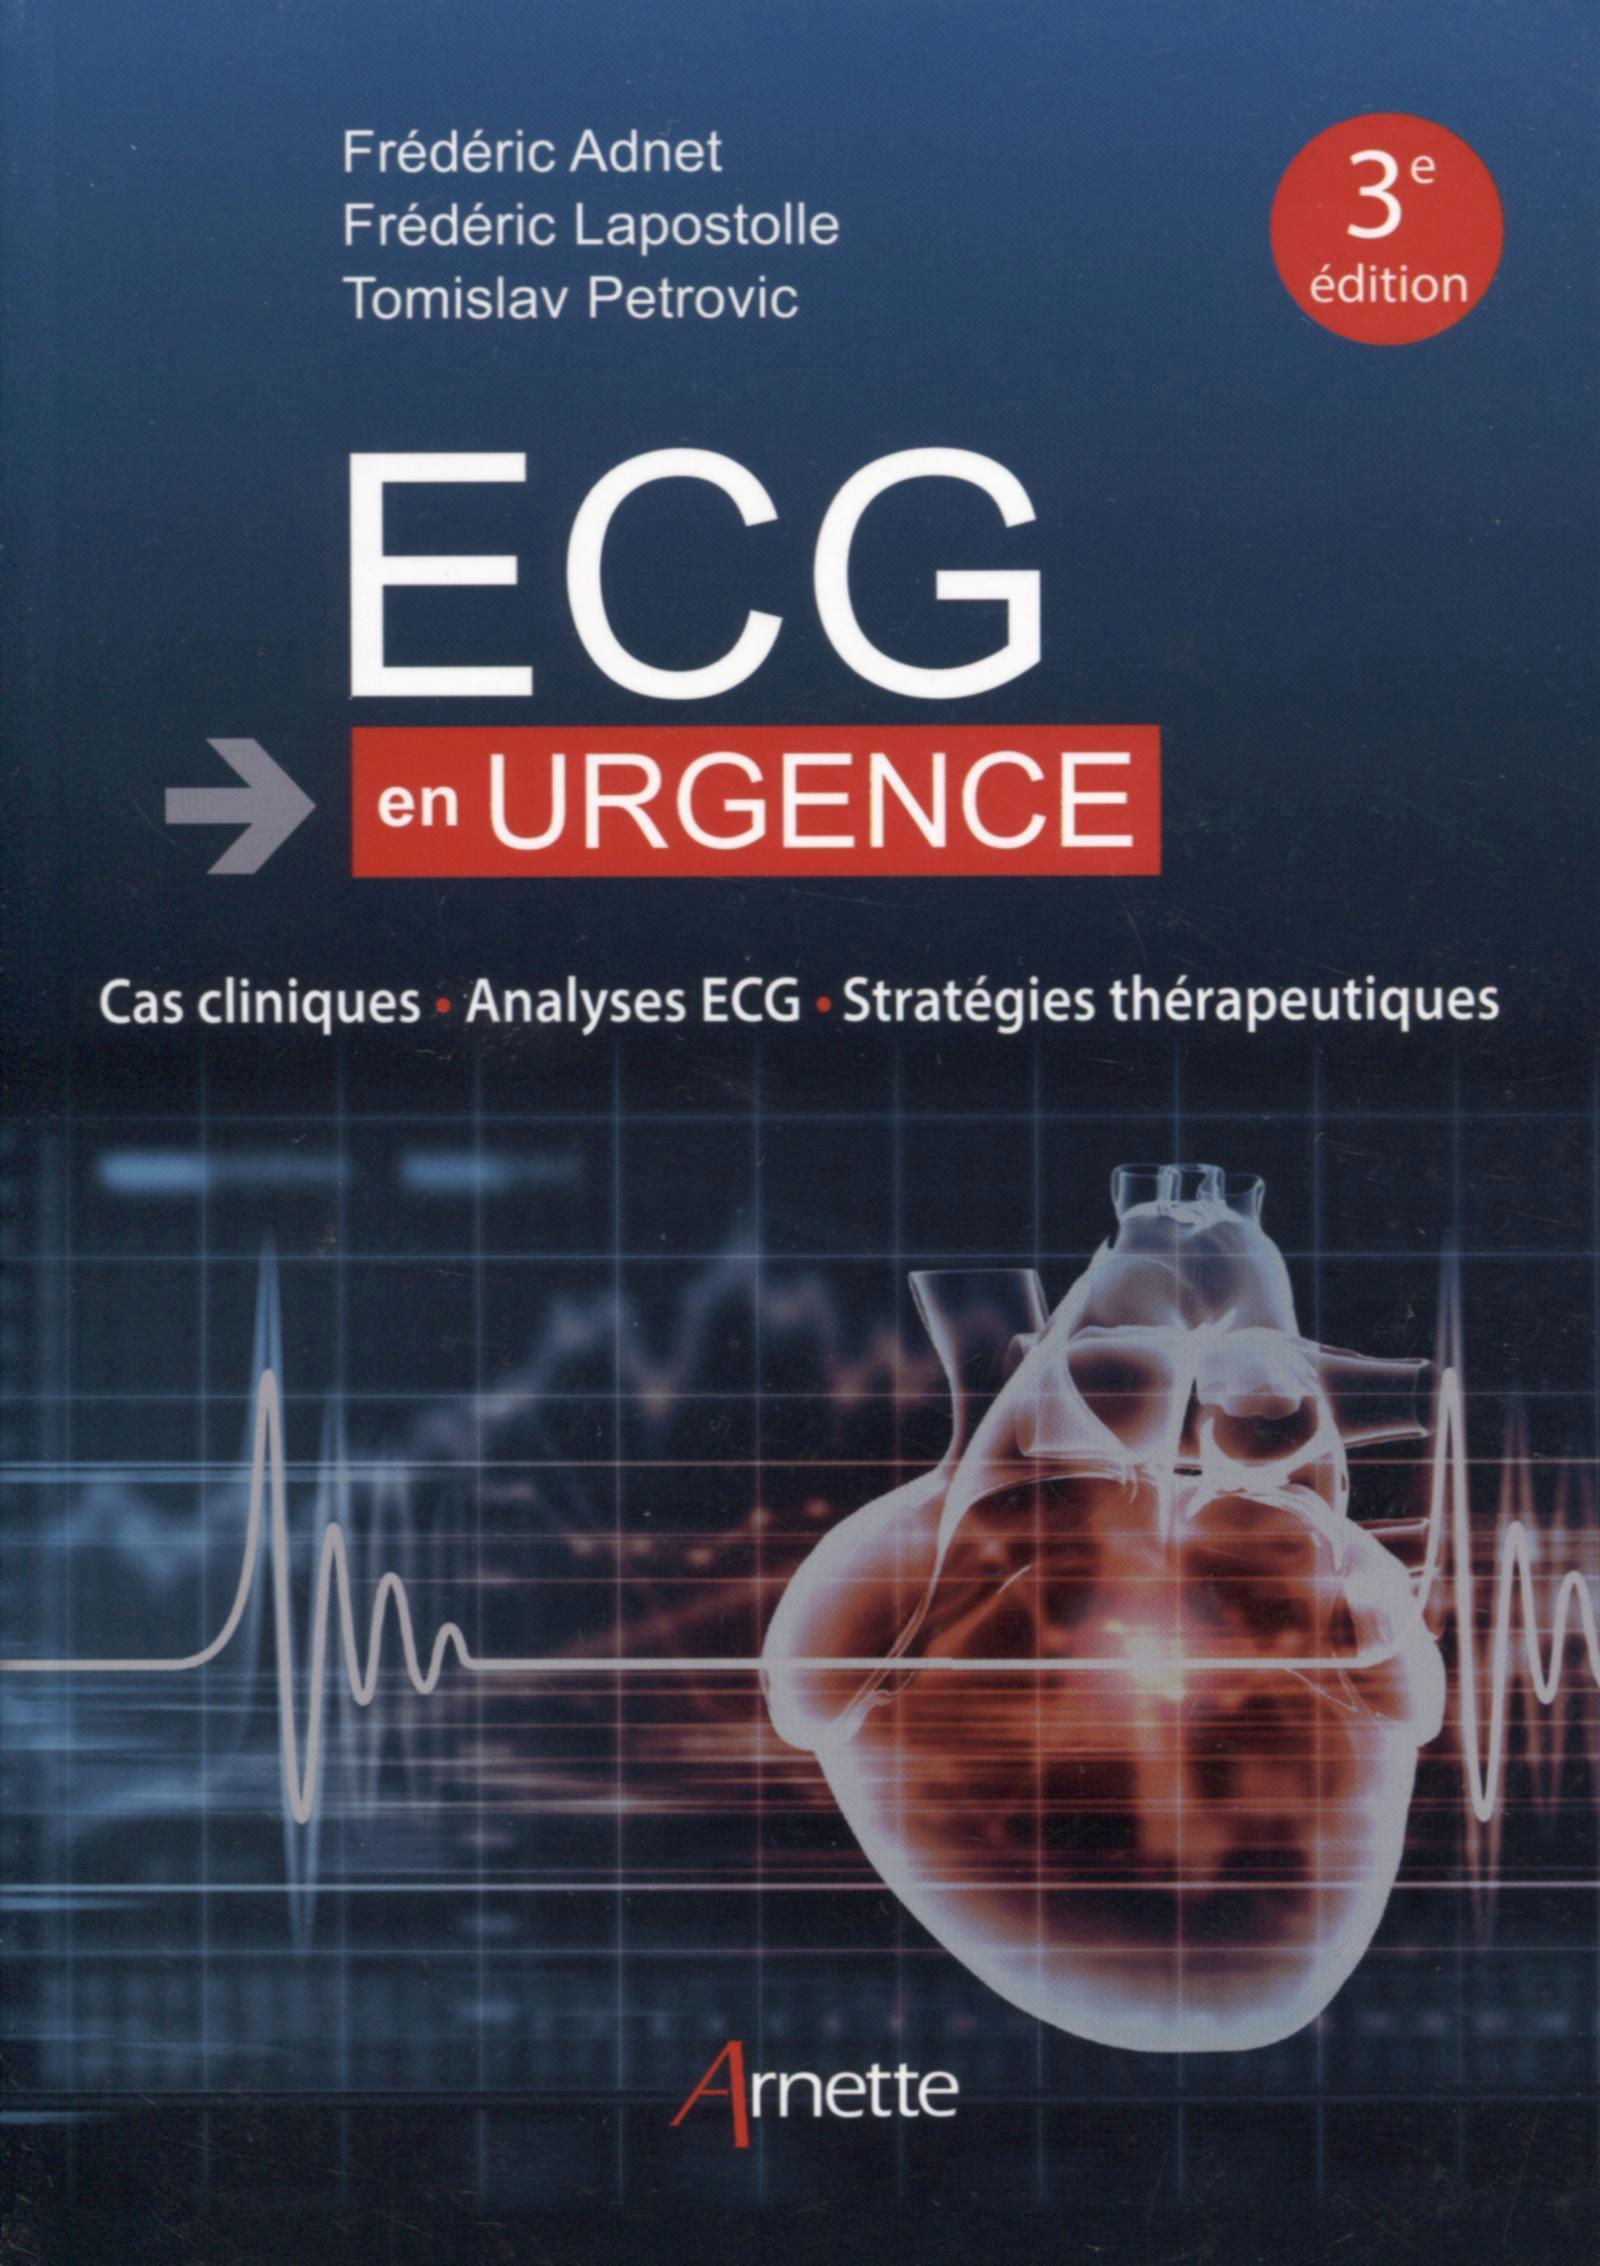 ECG EN URGENCE - CAS CLINIQUES - ANALYSES ECG - STRATEGIES THERAPEUTIQUES